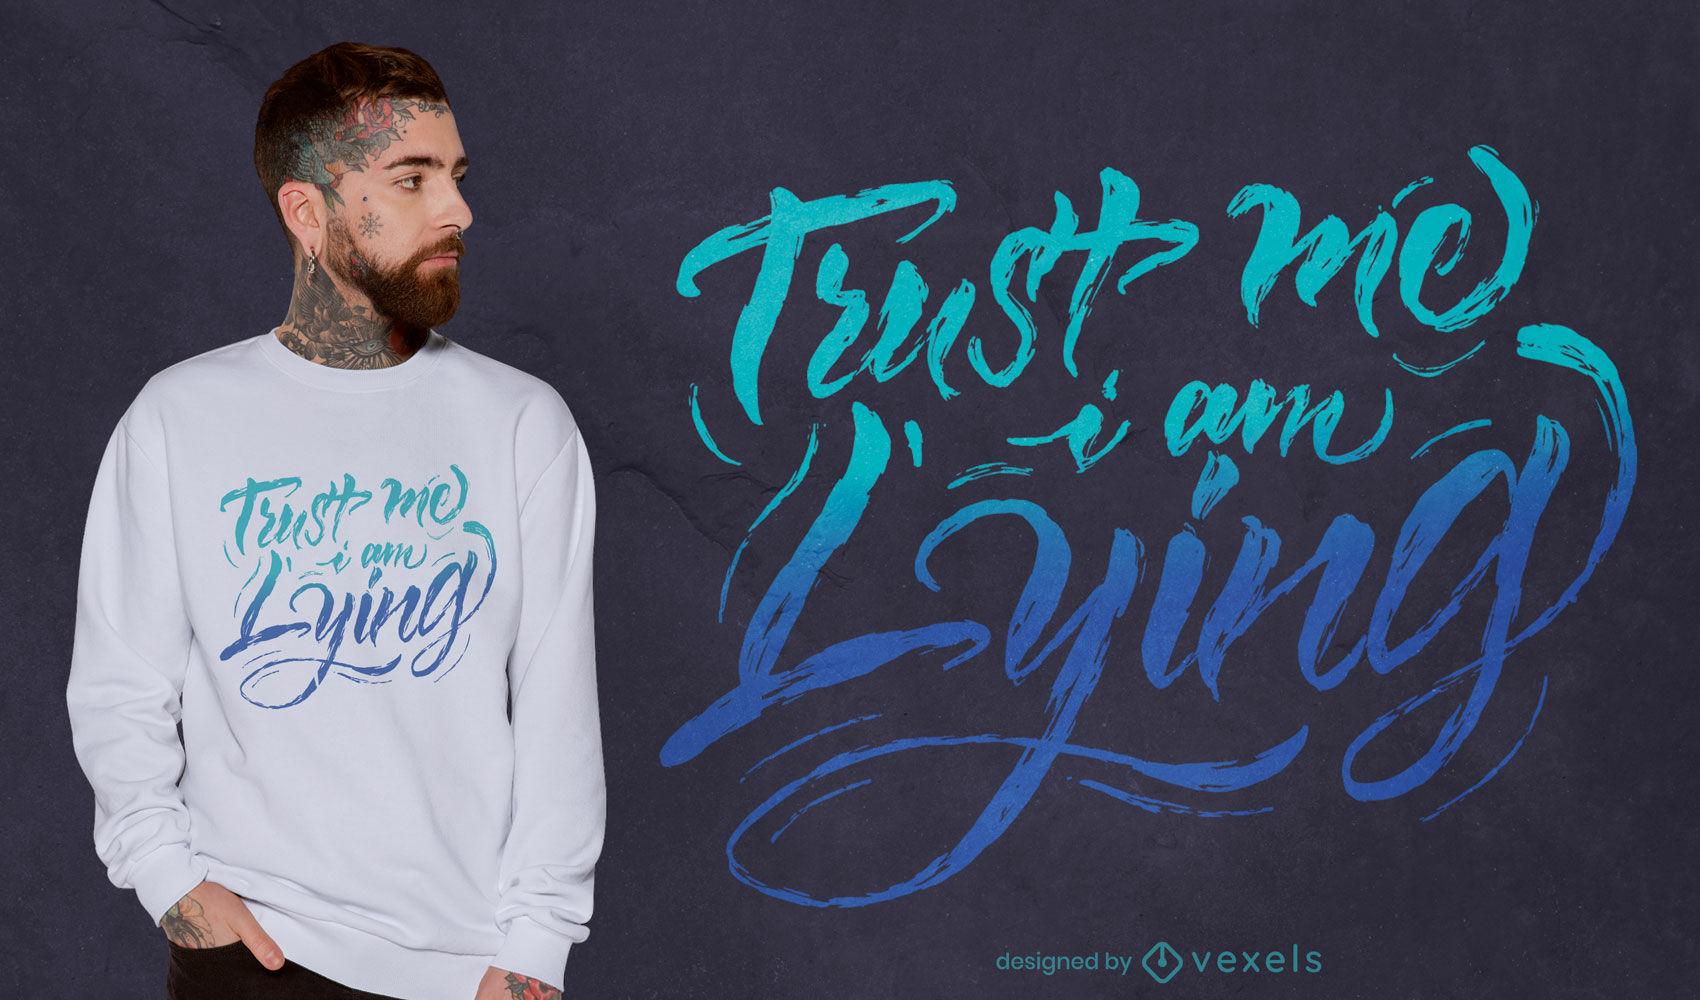 Trust me I'm lying lettering t-shirt design